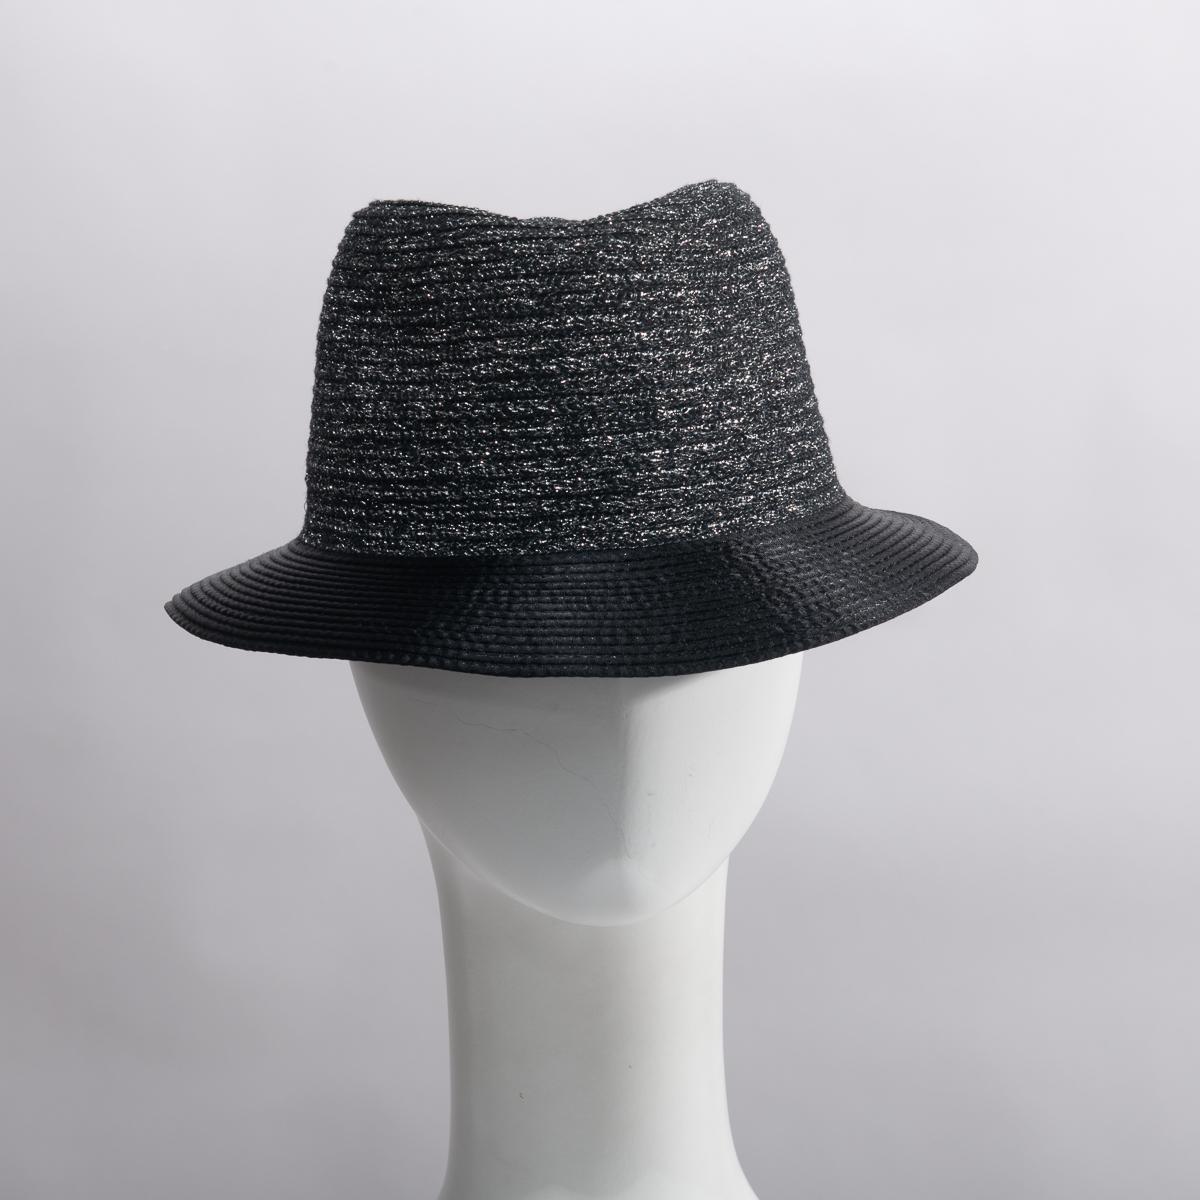 6b944cde43f5 Black Silver Metallic Stain Brim Fedora Hats - Sun Yorkos   KaKyco  Accessories